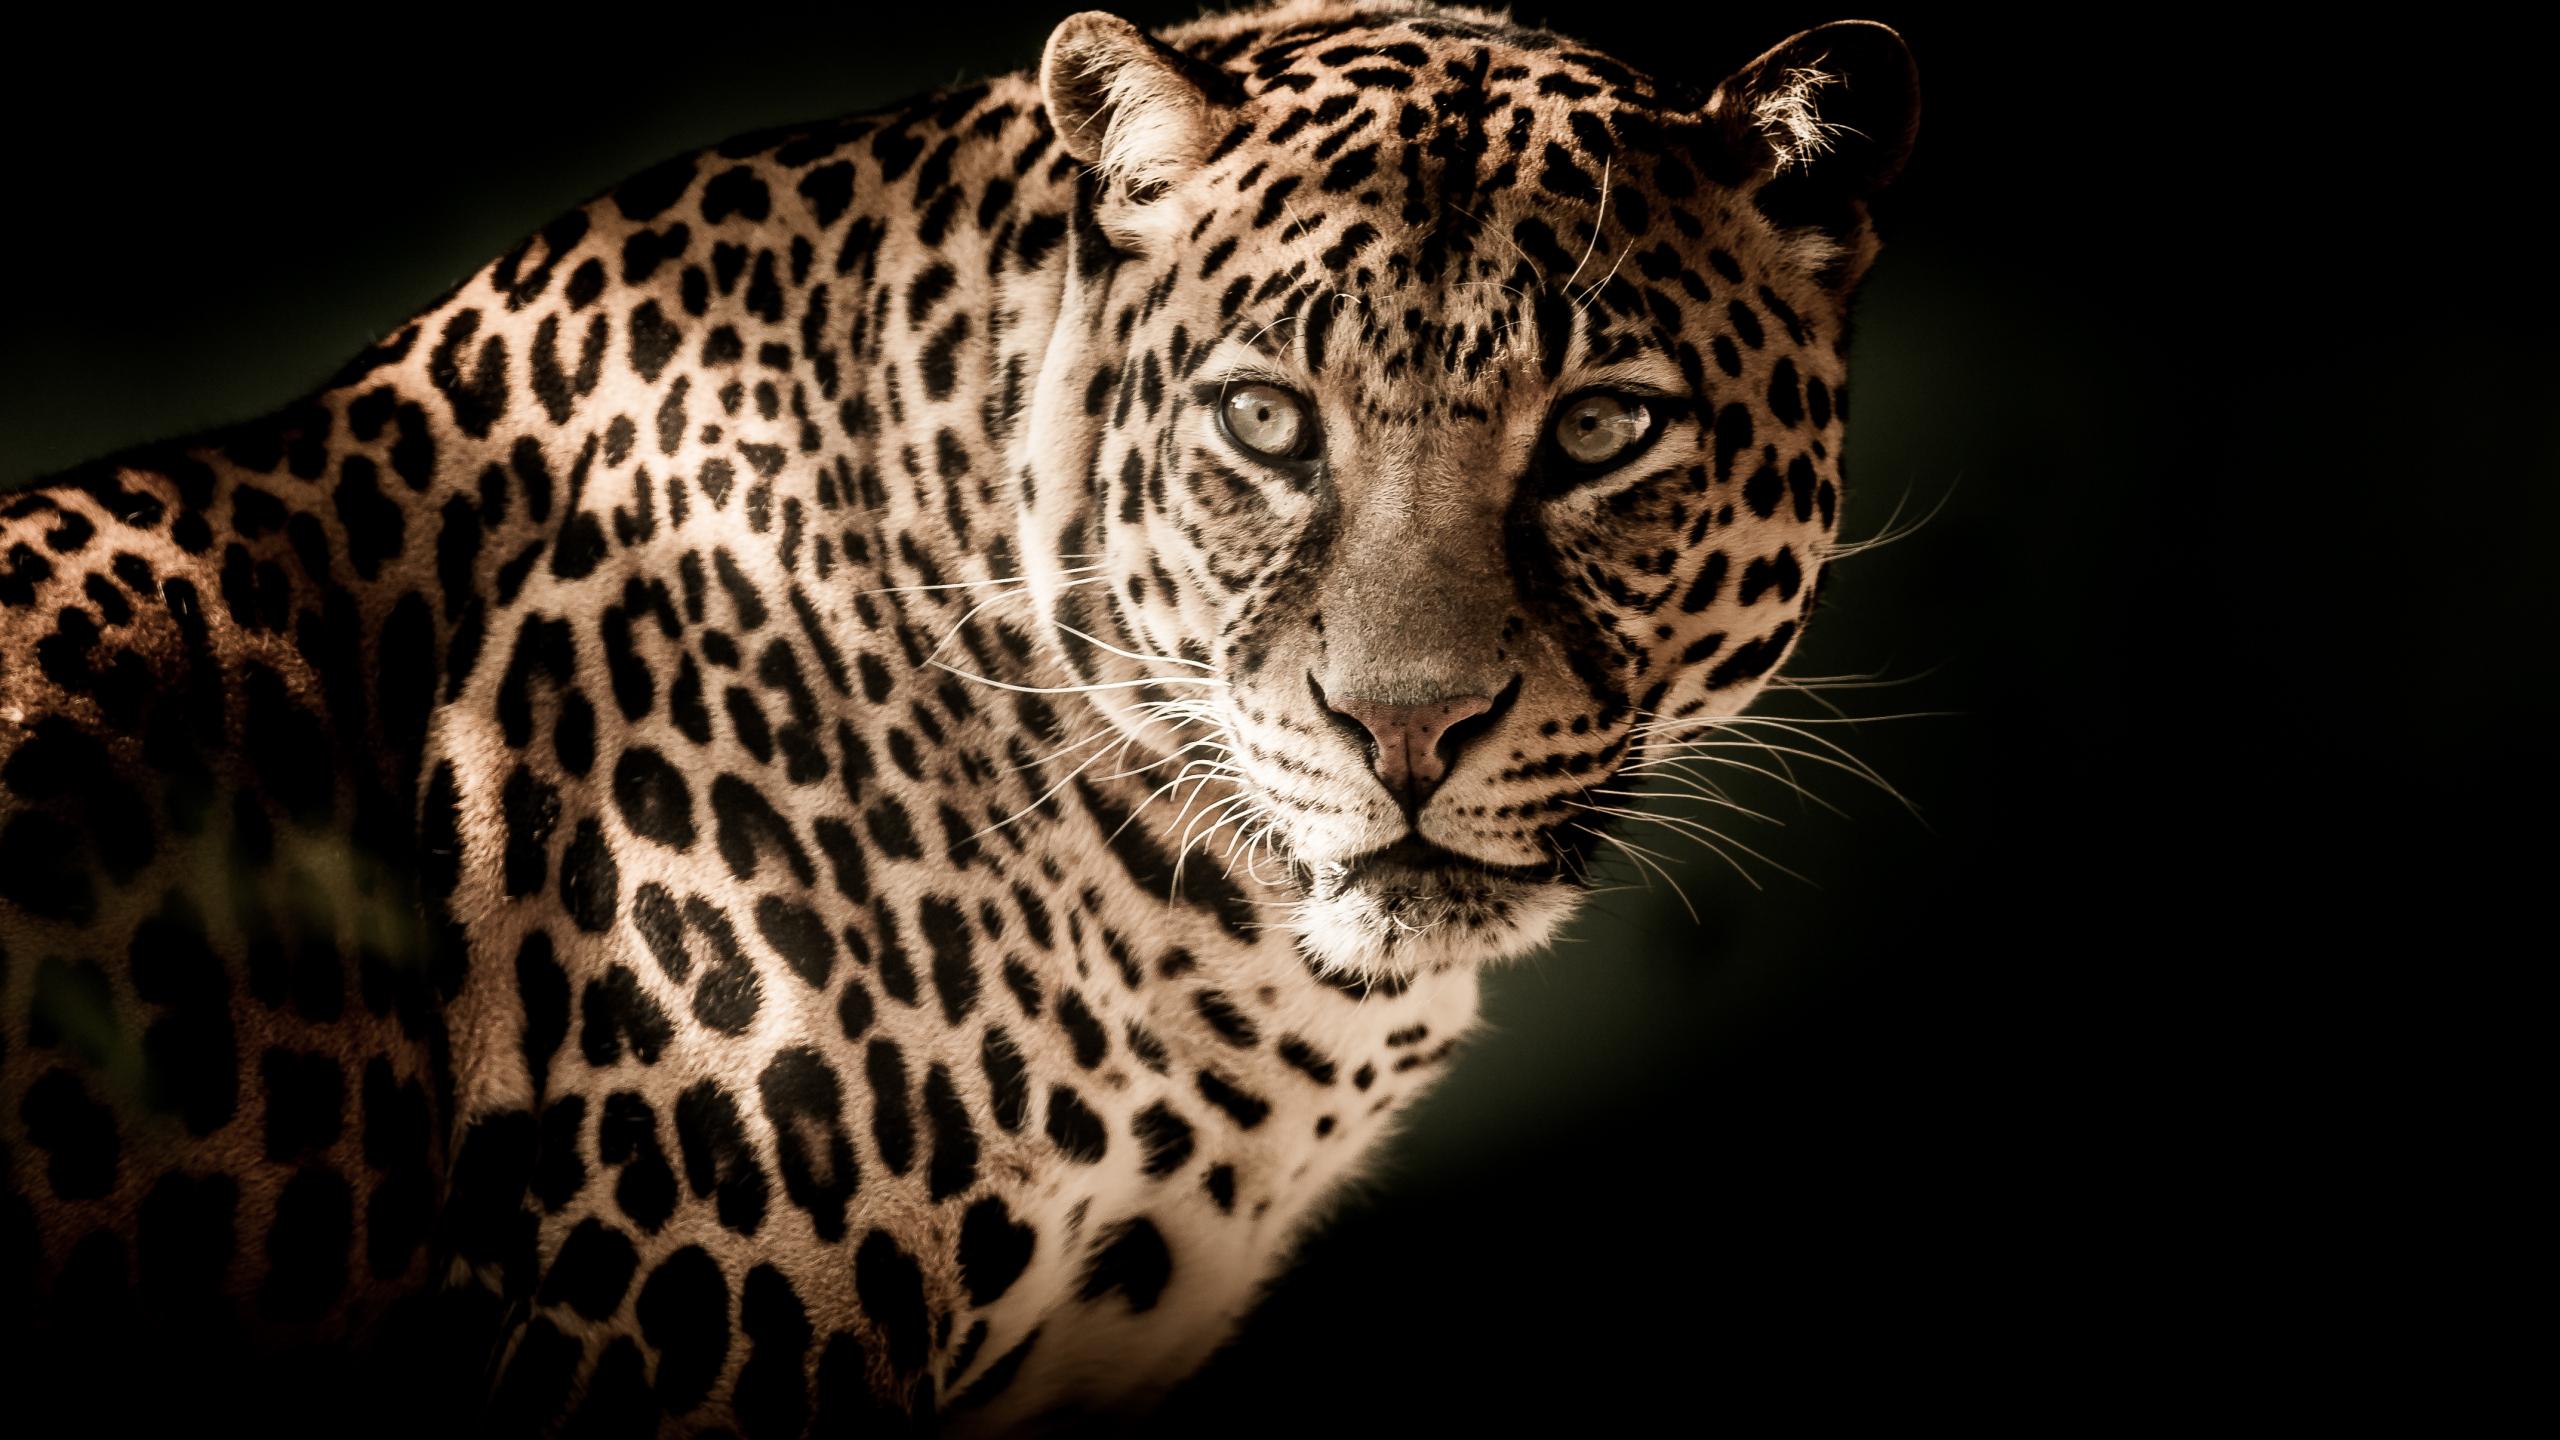 Desktop Wallpaper Leopard Predator Muzzle Wild Cat Portrait 4k Hd Image Picture Background 513602